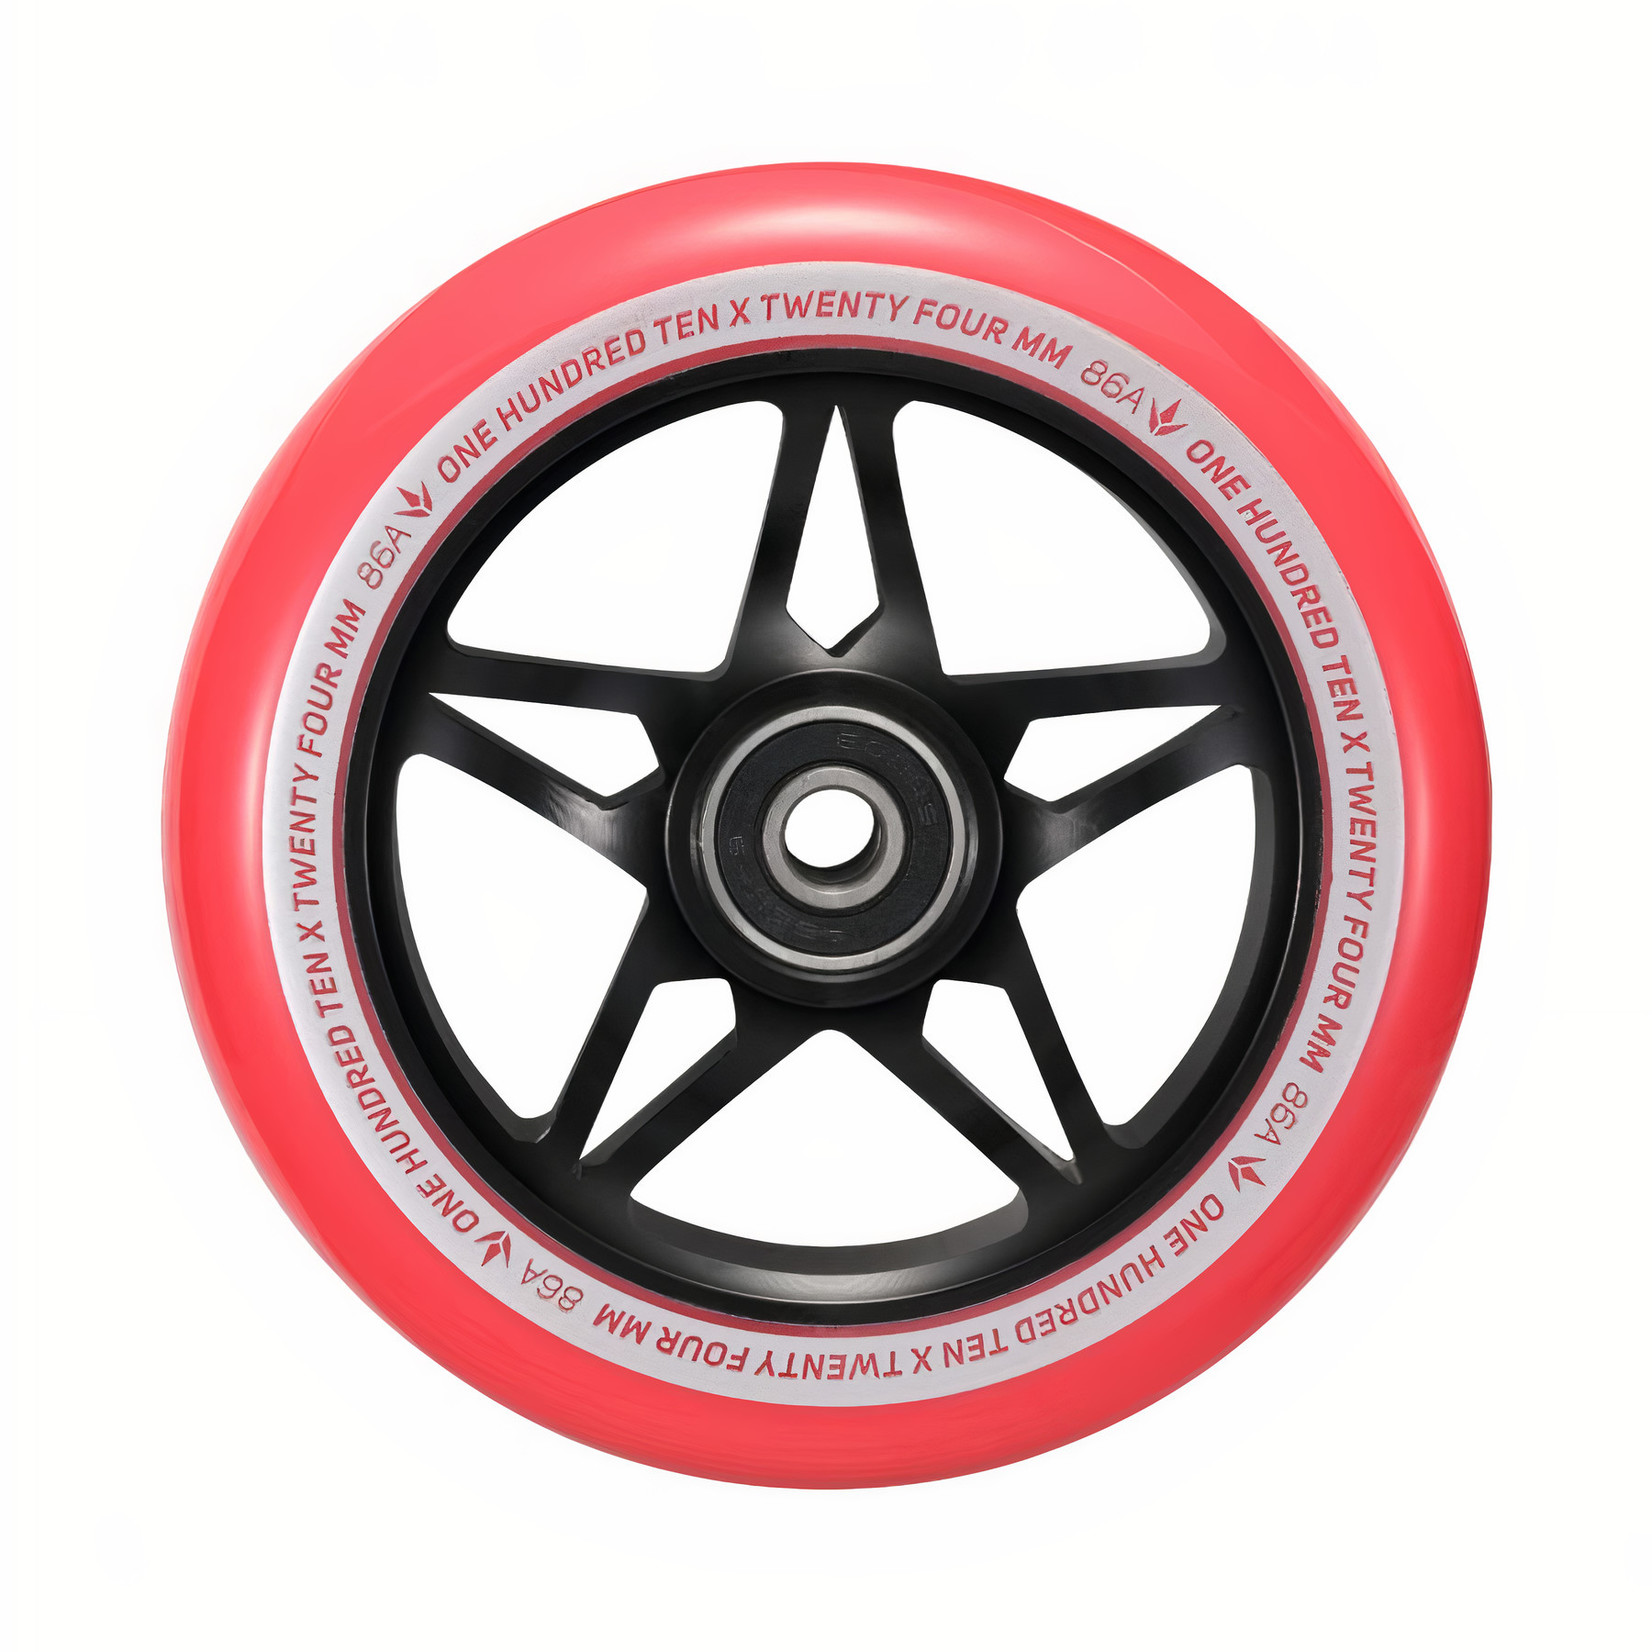 Envy Envy - 110mm S3 Wheel SINGLE - Black / Red